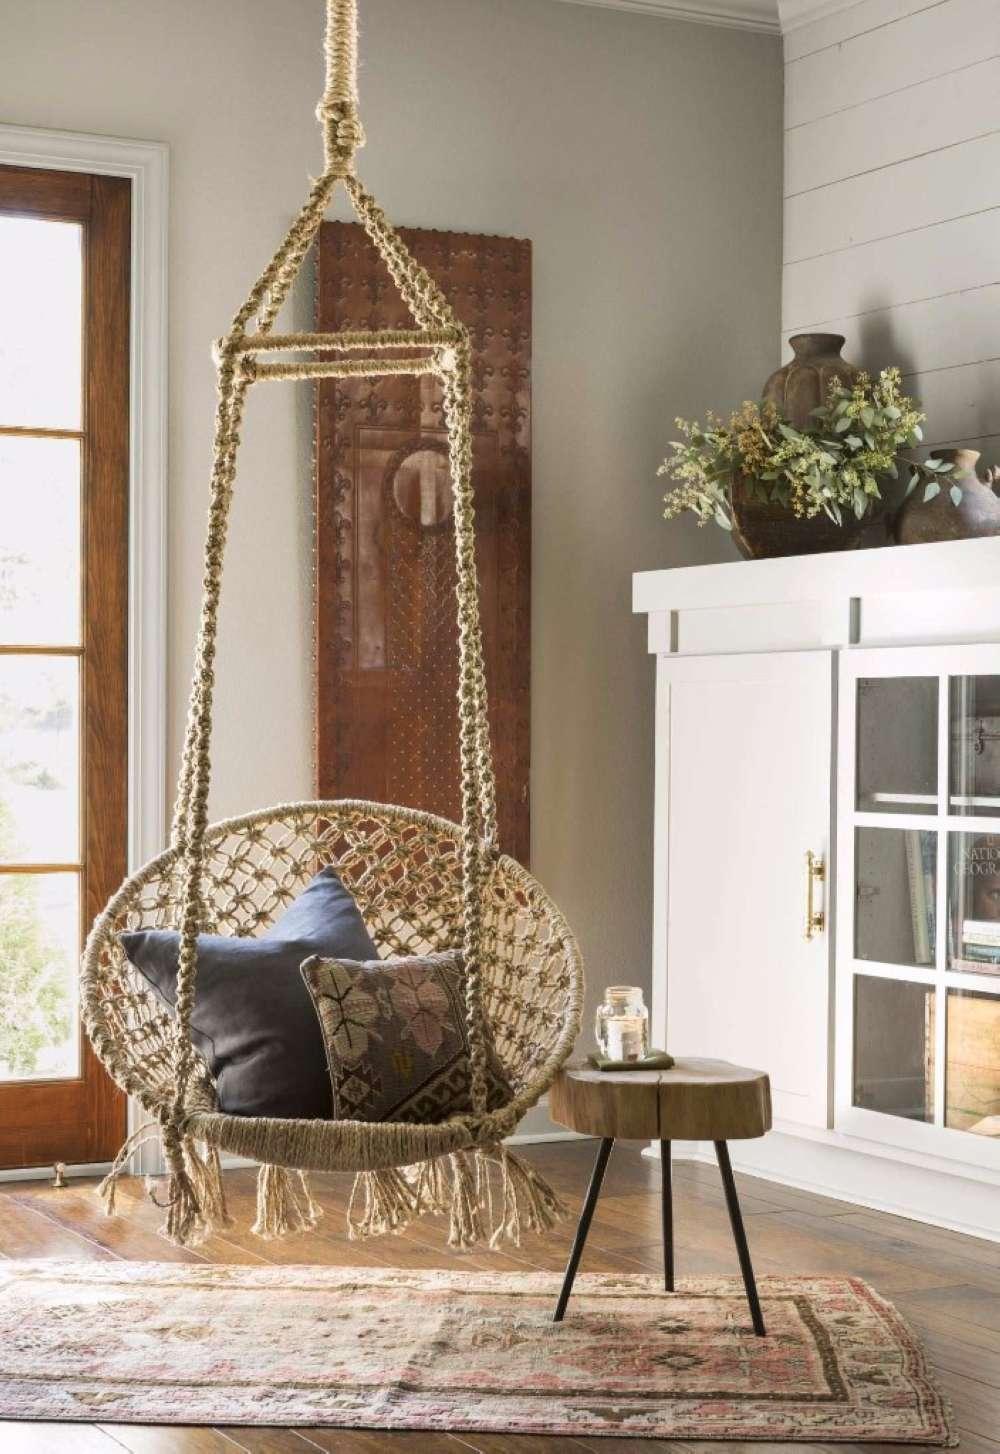 Arkansas-interior-design-Southern-Comfort-k-lewis-interior-design-IMG_006